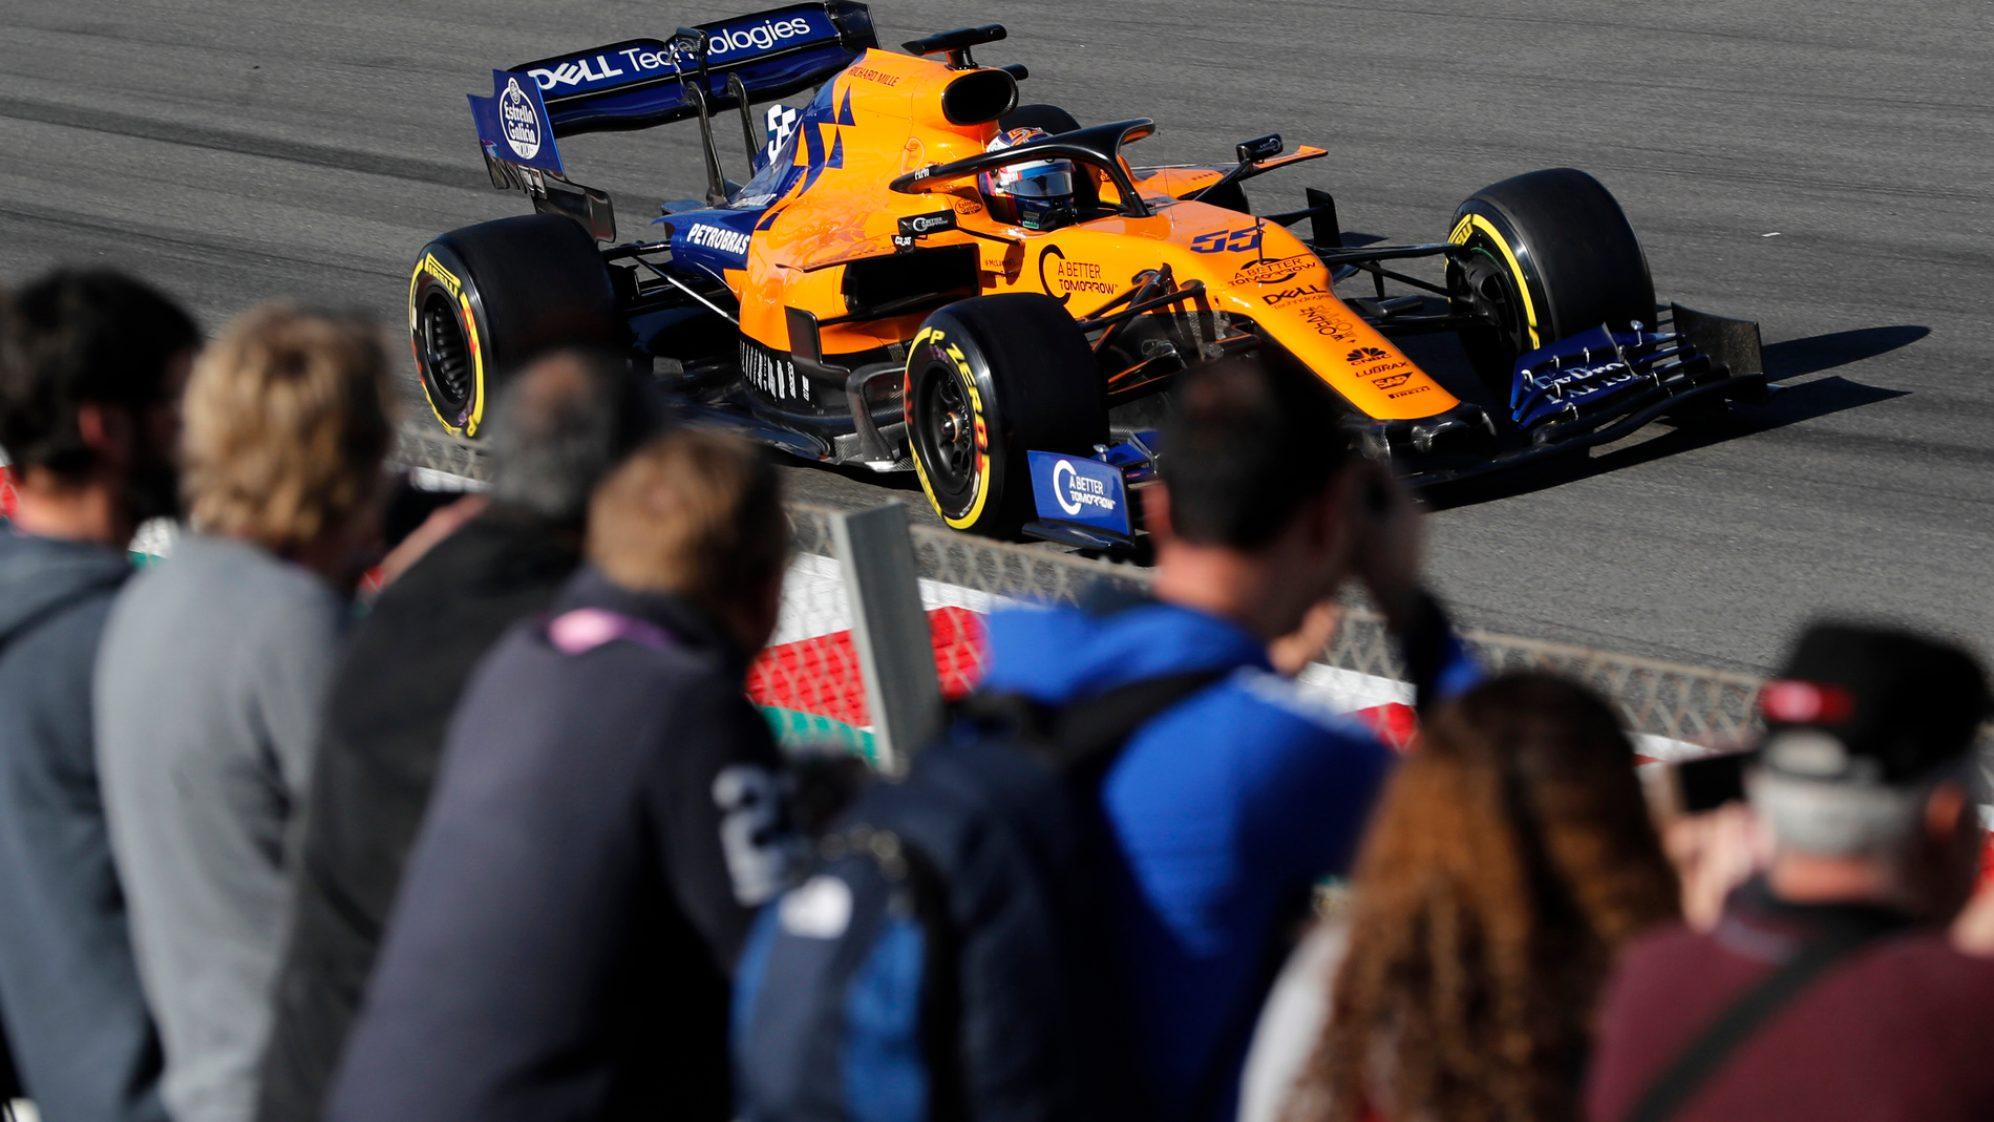 2019_F1_testing_2_day_2_0000